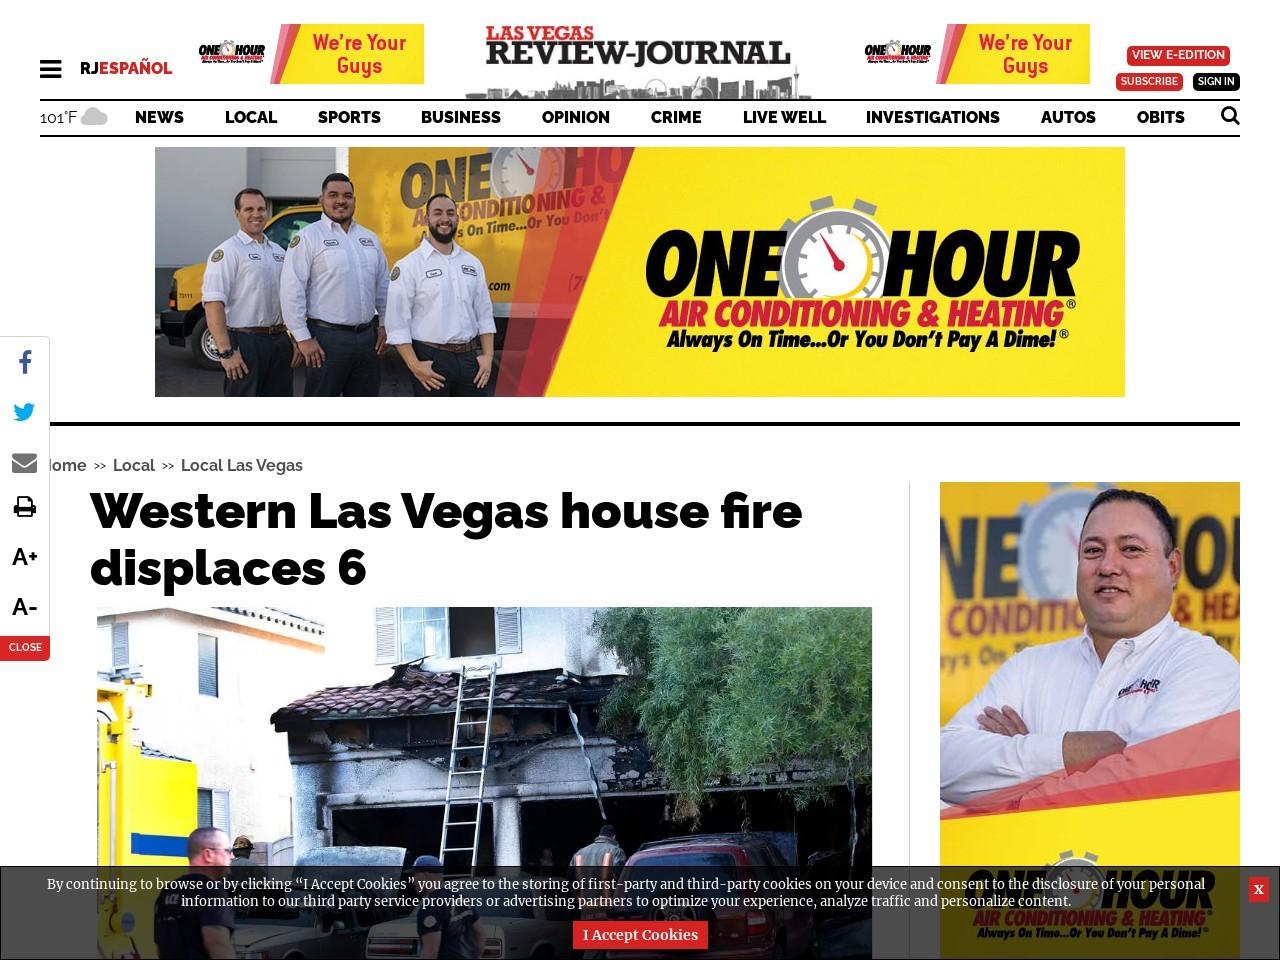 Western Las Vegas house fire displaces 6